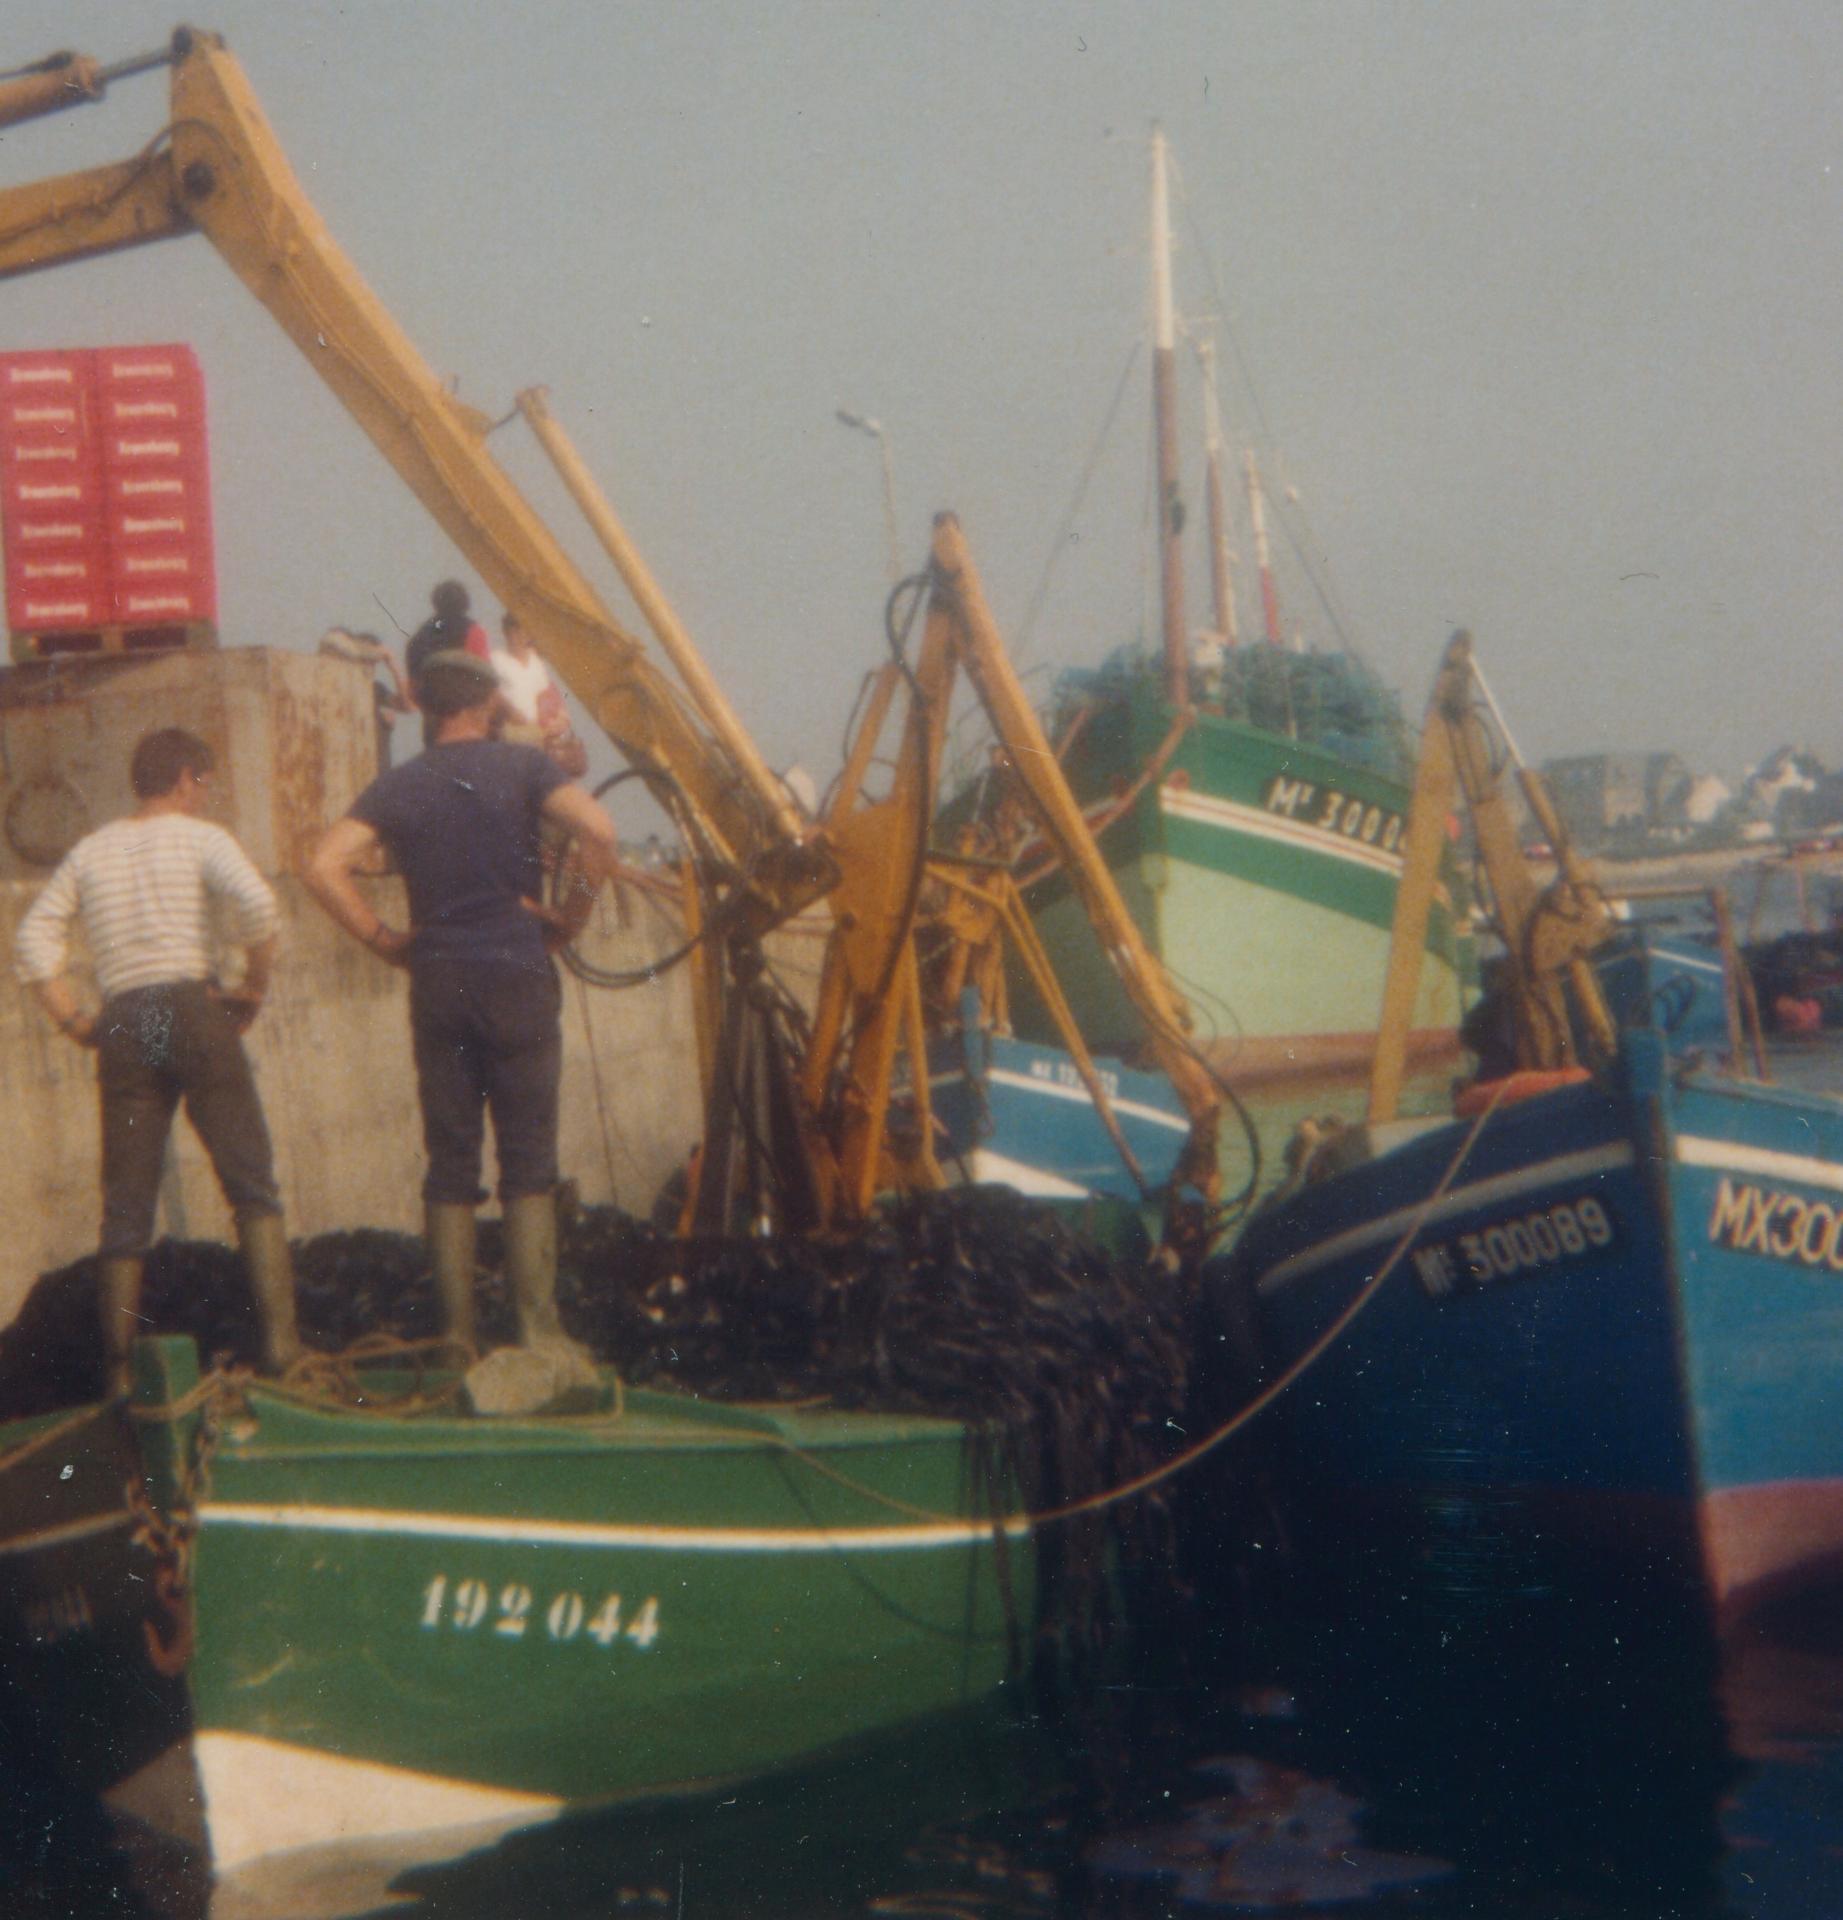 Francoise oiseau des iles la bretagne roscoff 1980 erwan guegueniat 2